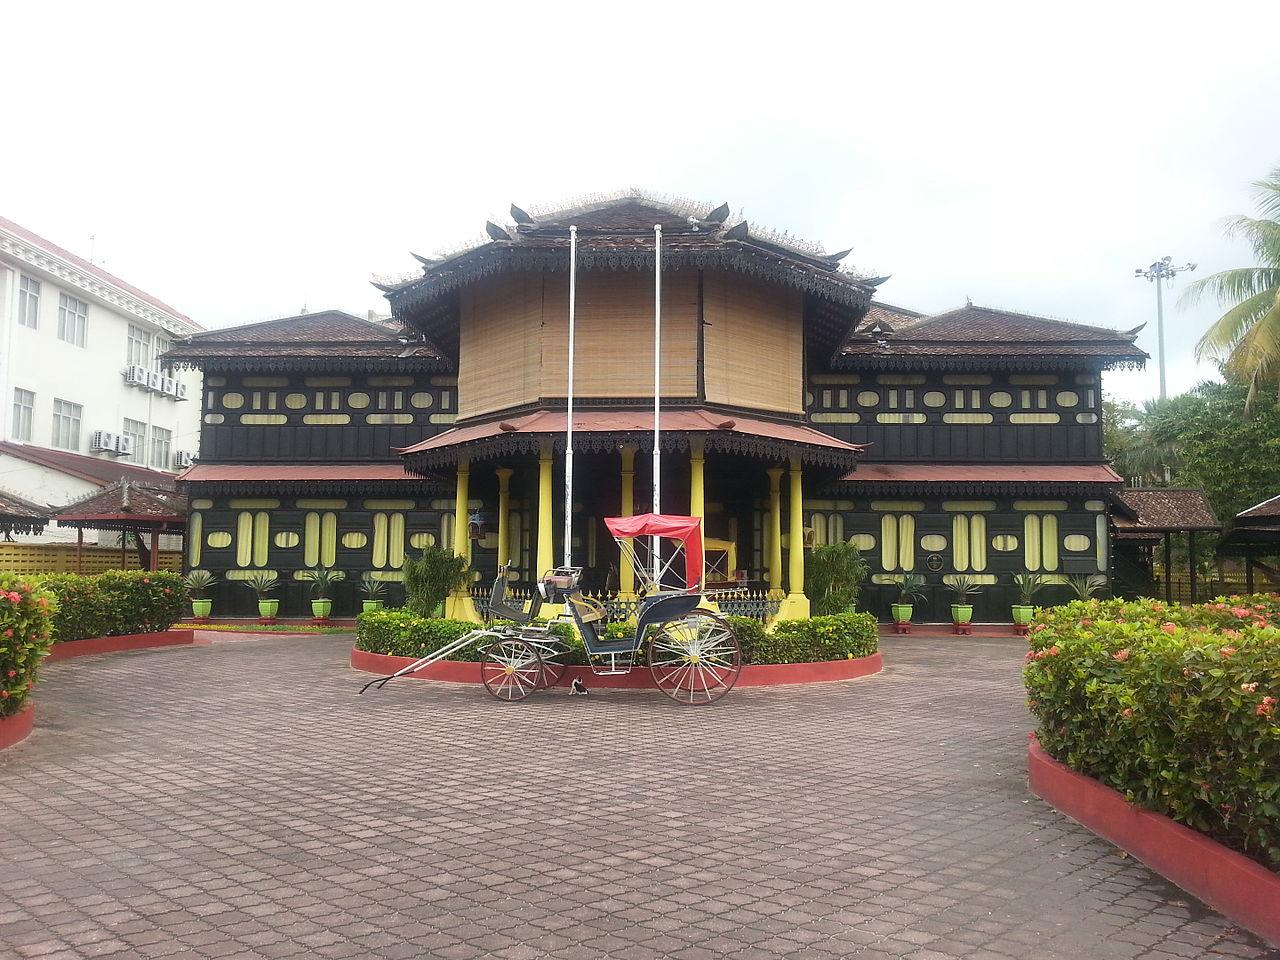 Xmatch Free Sex Dating in Kota Bharu Labuan